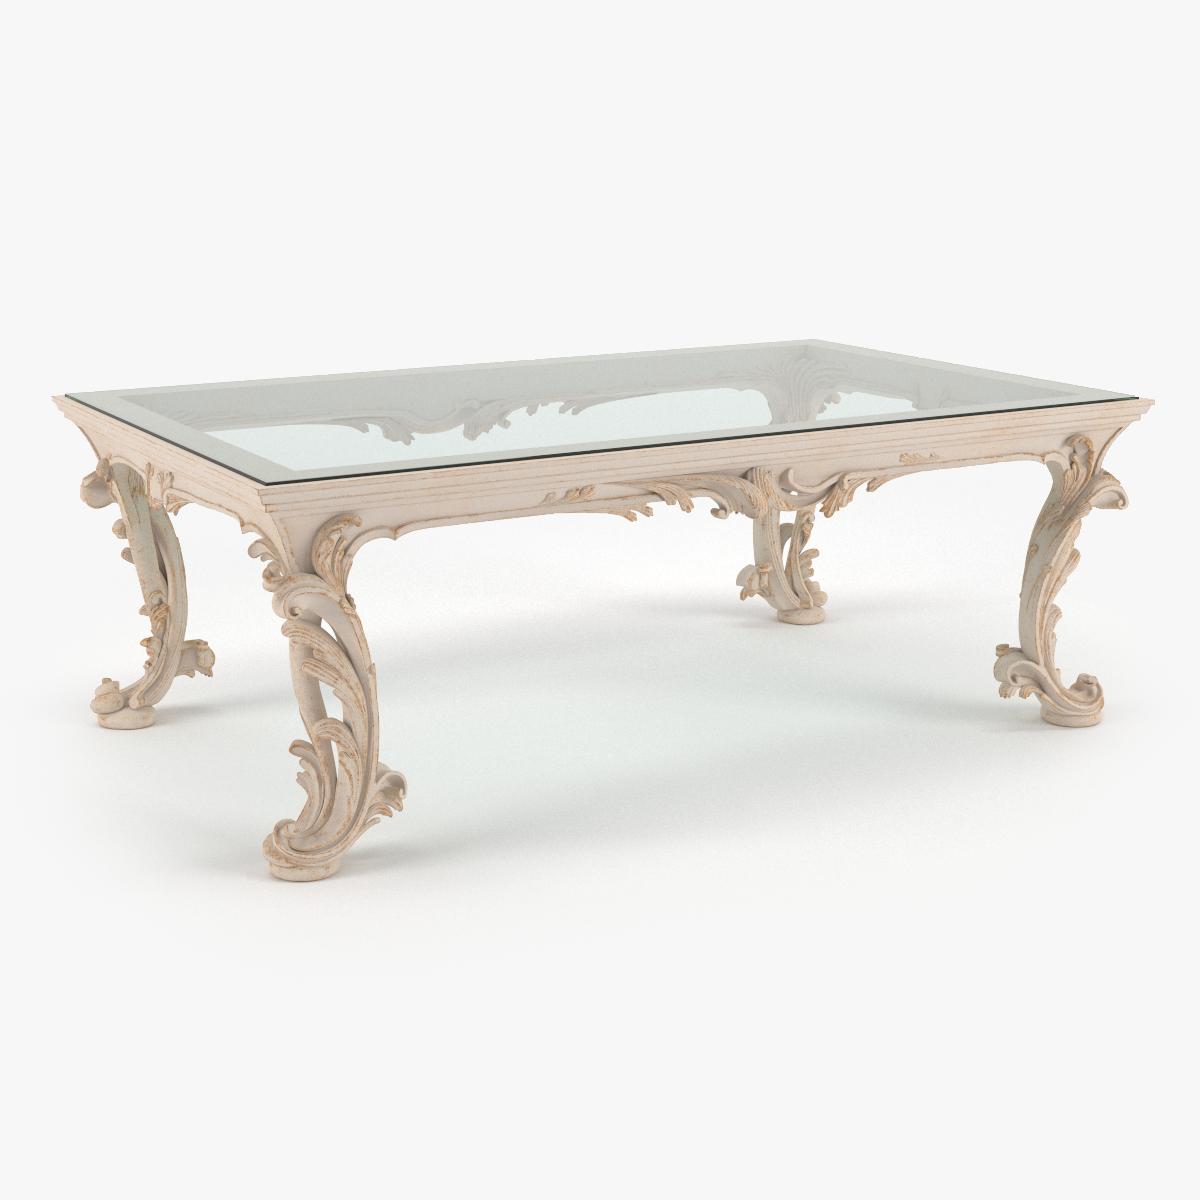 Classic Coffee Table Chelini Art 1064 Ivory 3d Model Luxury Coffee Table Coffee Table Classic Coffee Table [ 1200 x 1200 Pixel ]